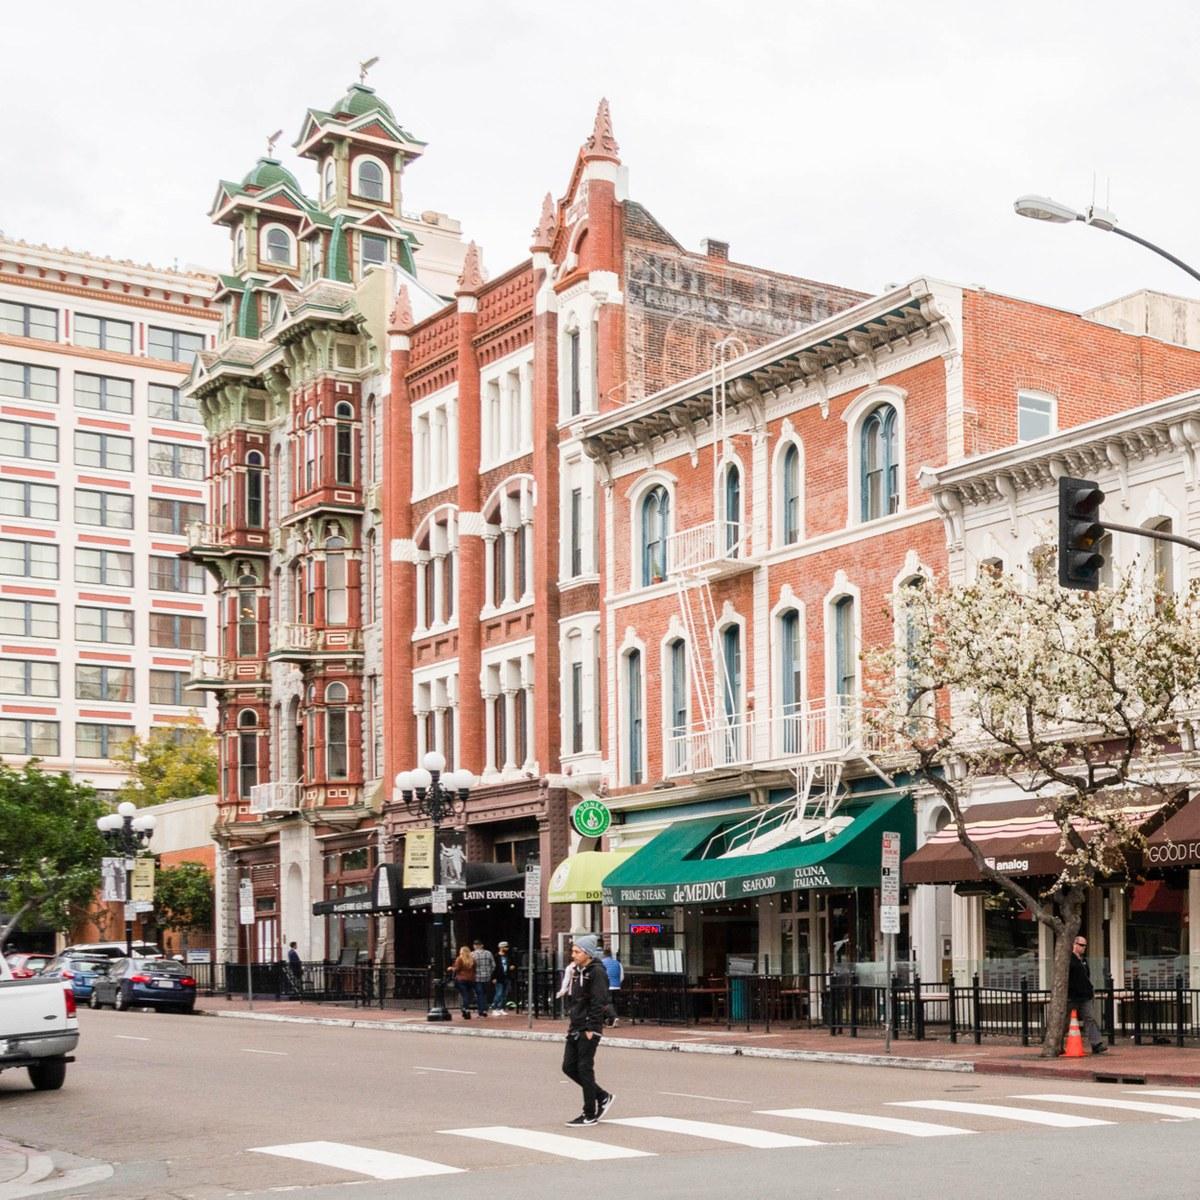 Gaslamp Quarter, San Diego CA - Neighborhood Guide